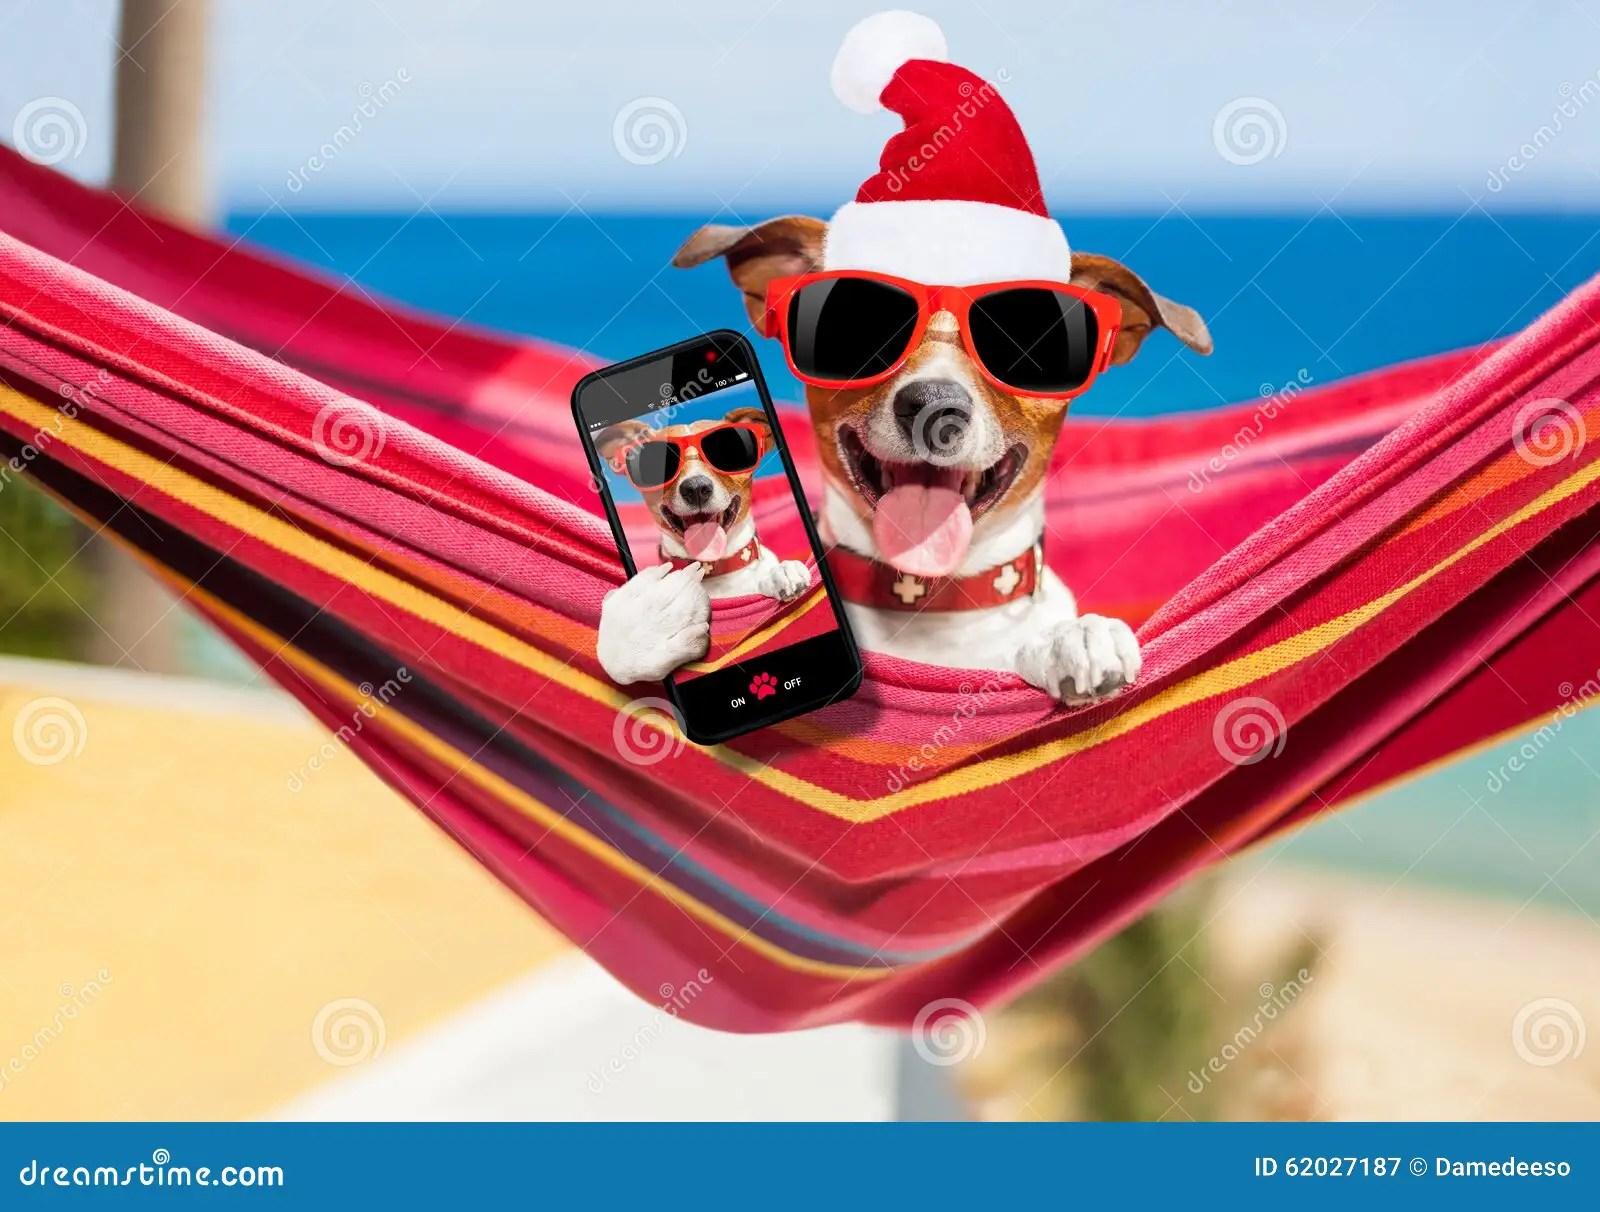 Dog On Hammock At Christmas Stock Photo Image 62027187